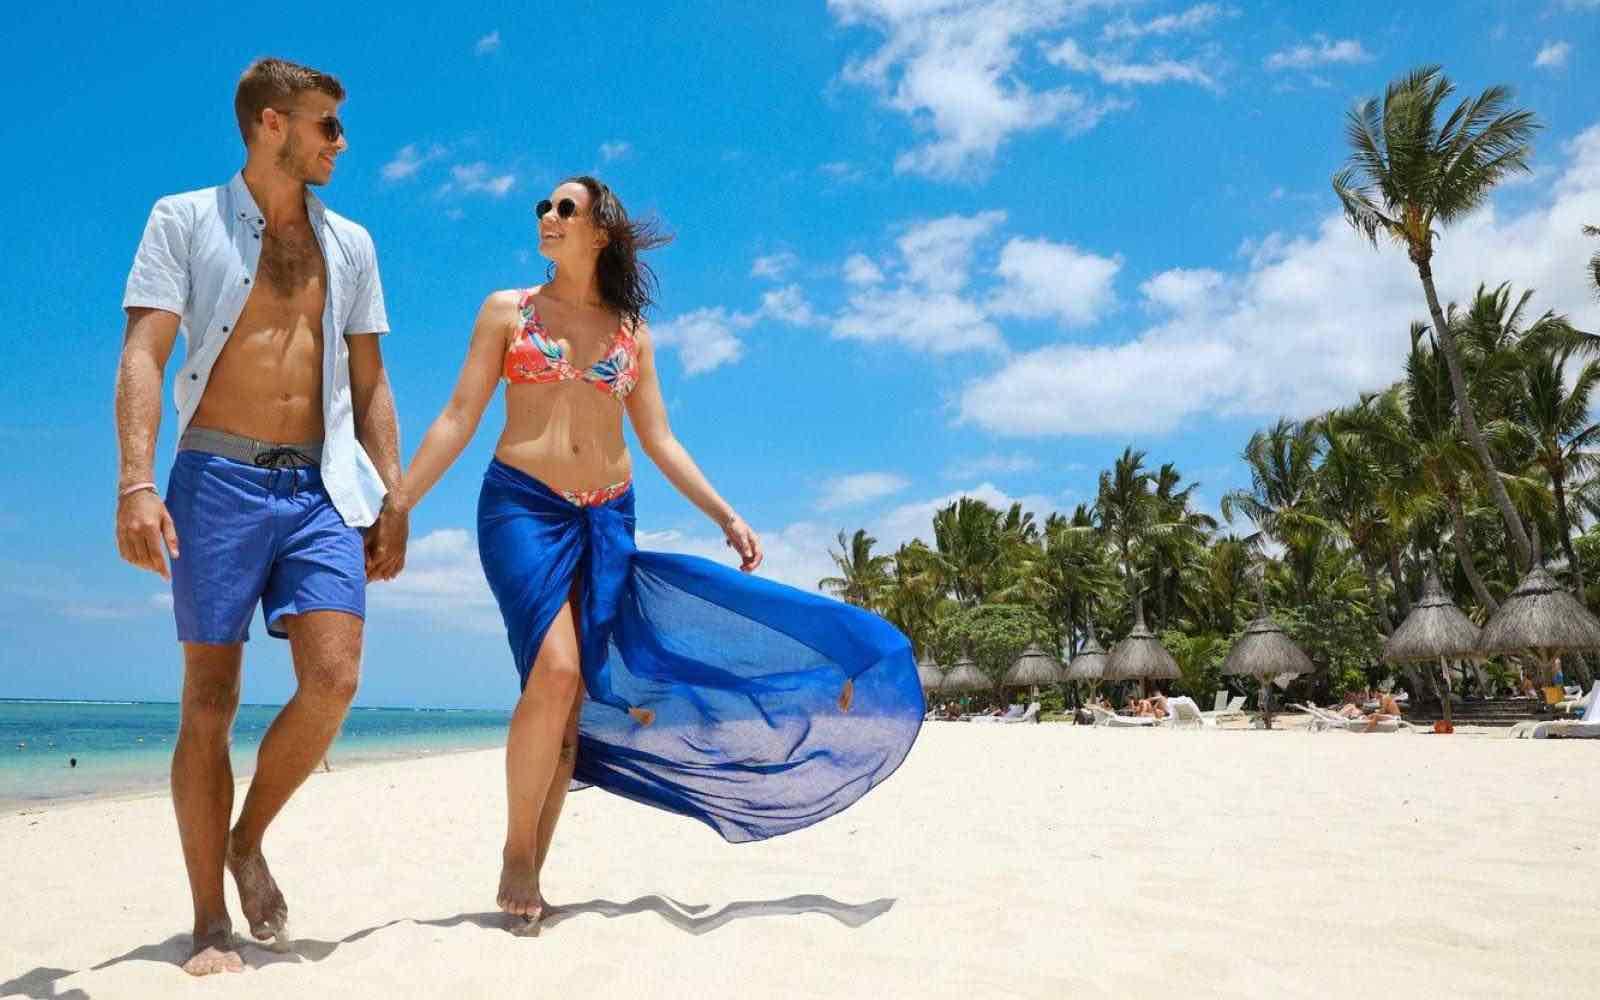 Beach lifestyle on the Mauritius